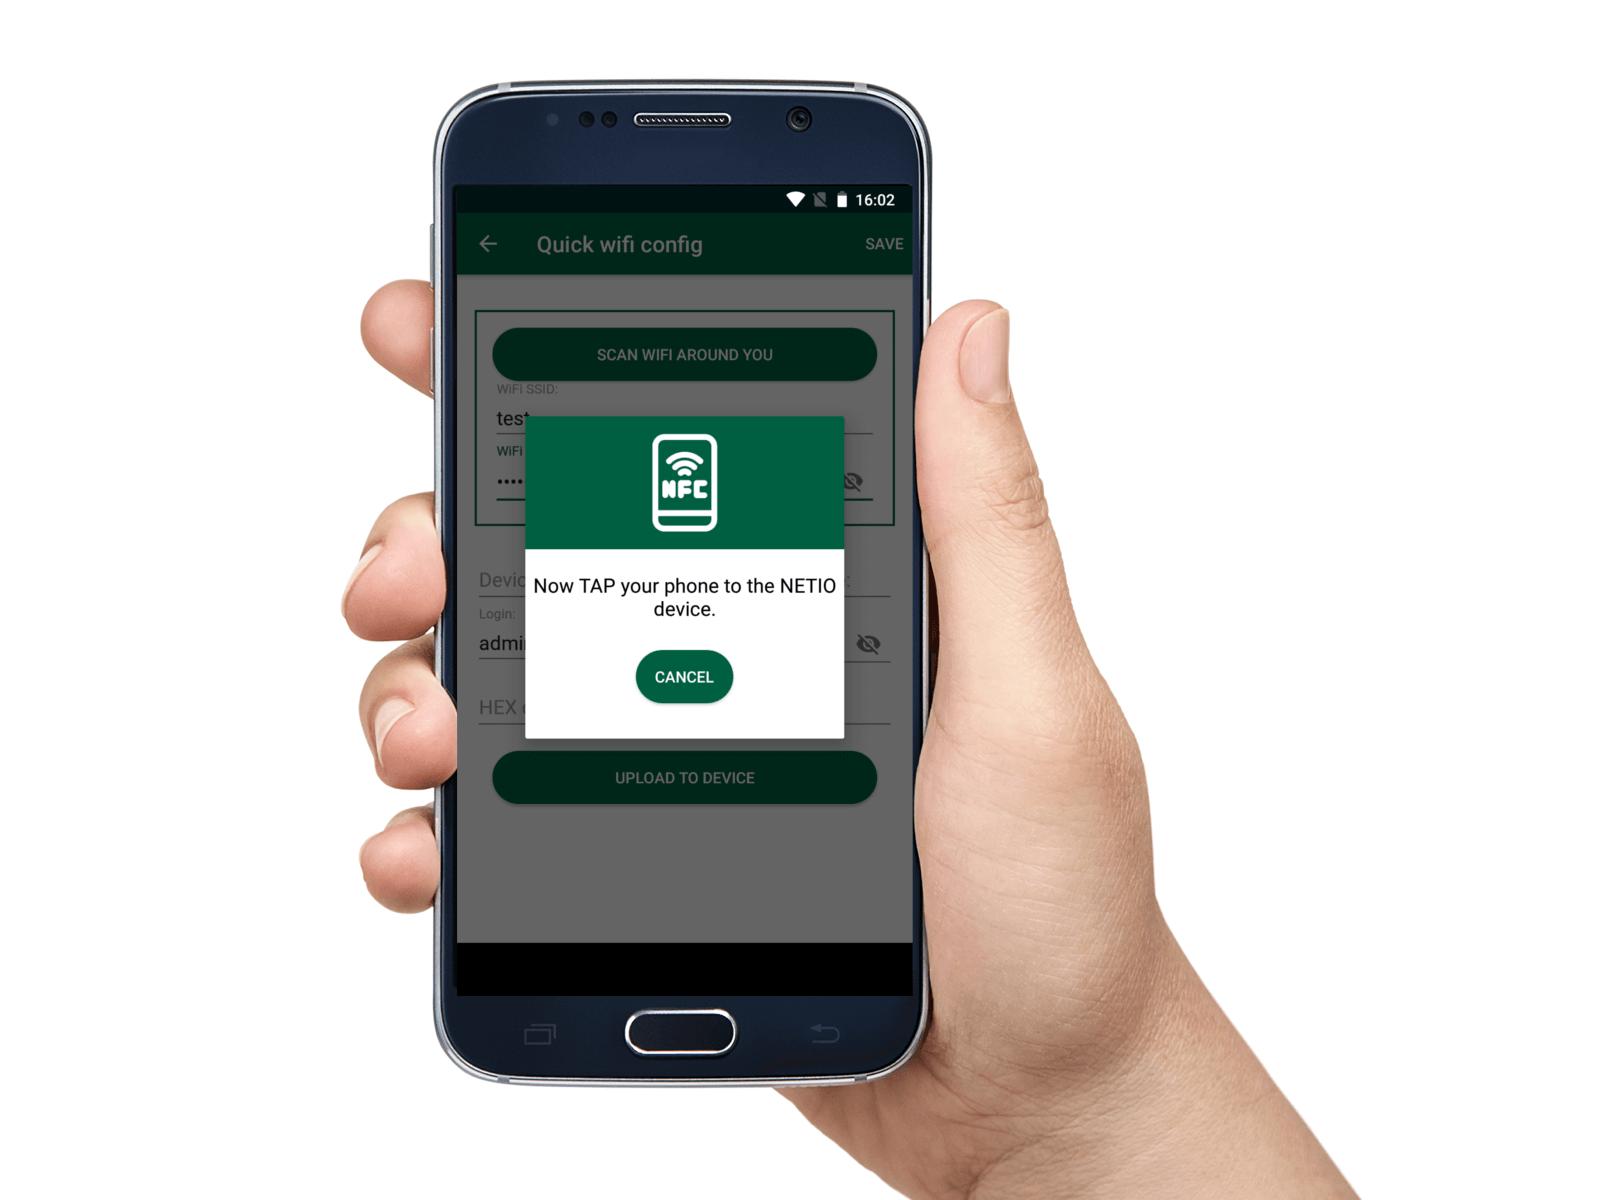 NETIO Mobile2 NFC network preconfiguration